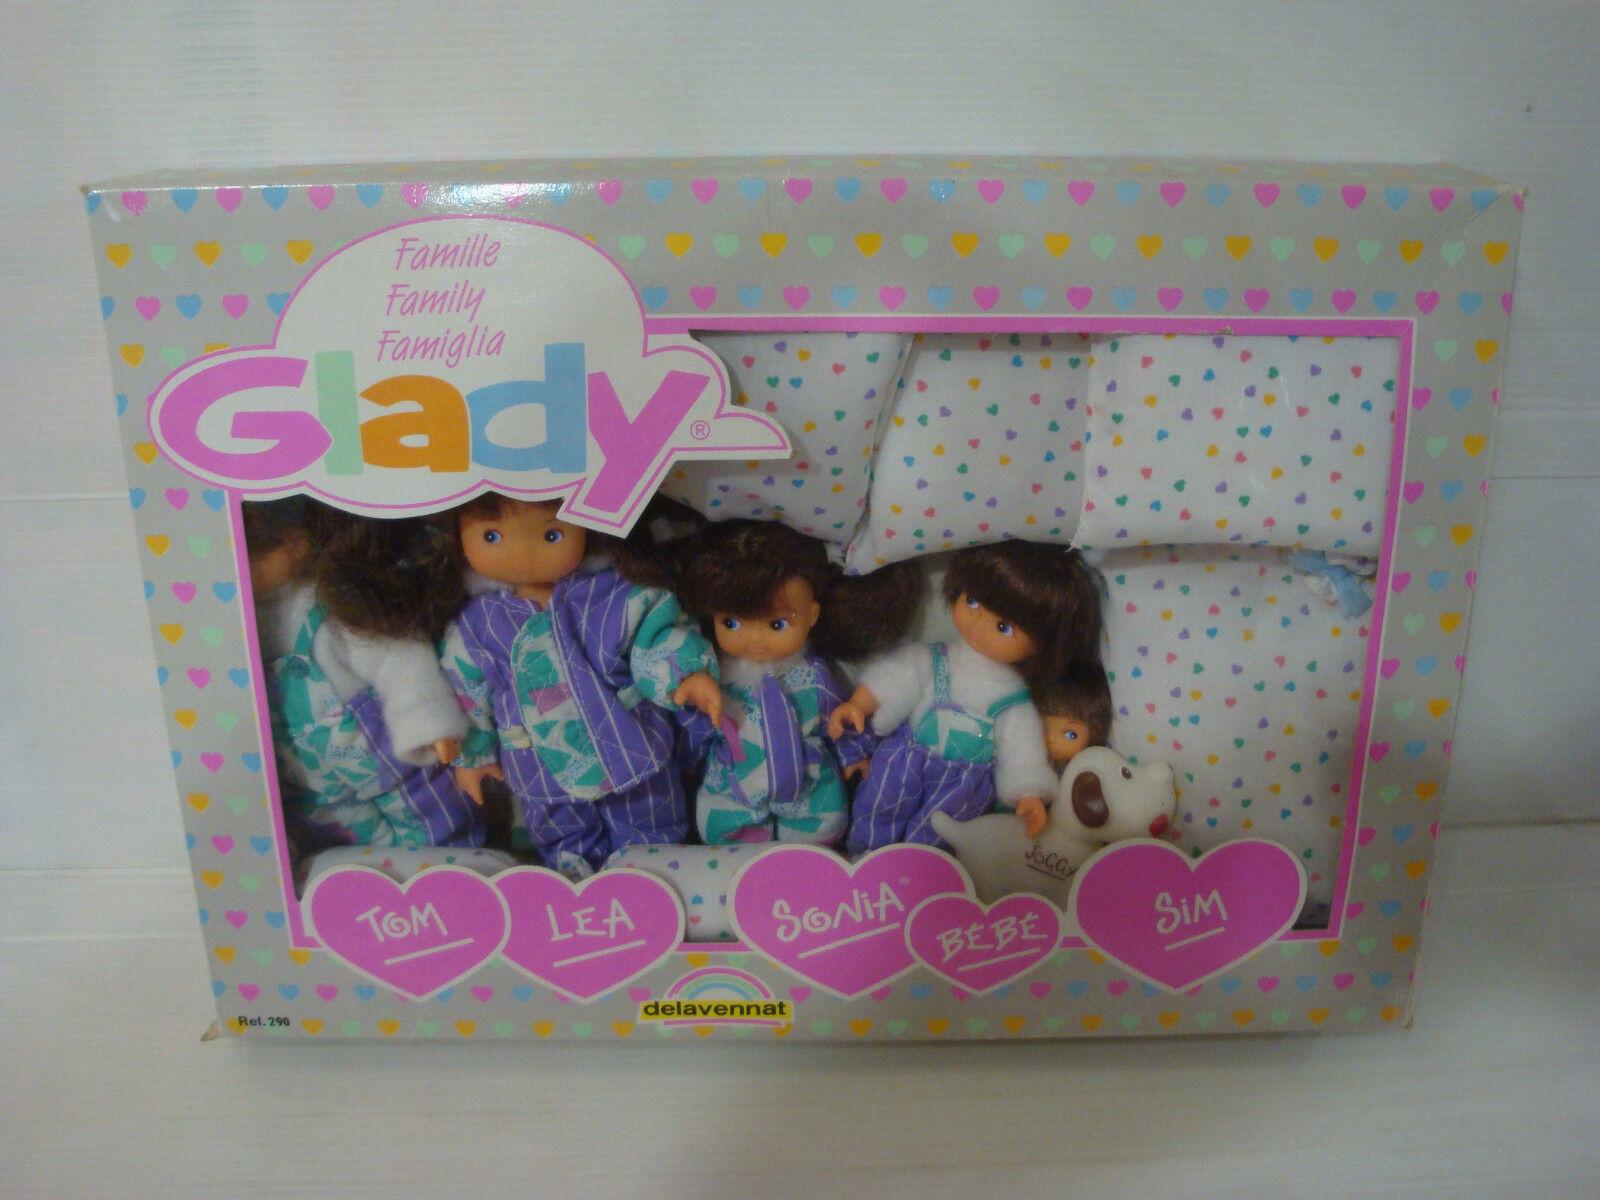 Coffret poupée Famille Glady ref 290 - DELAVENNAT - Family Famiglia - Etat neuf